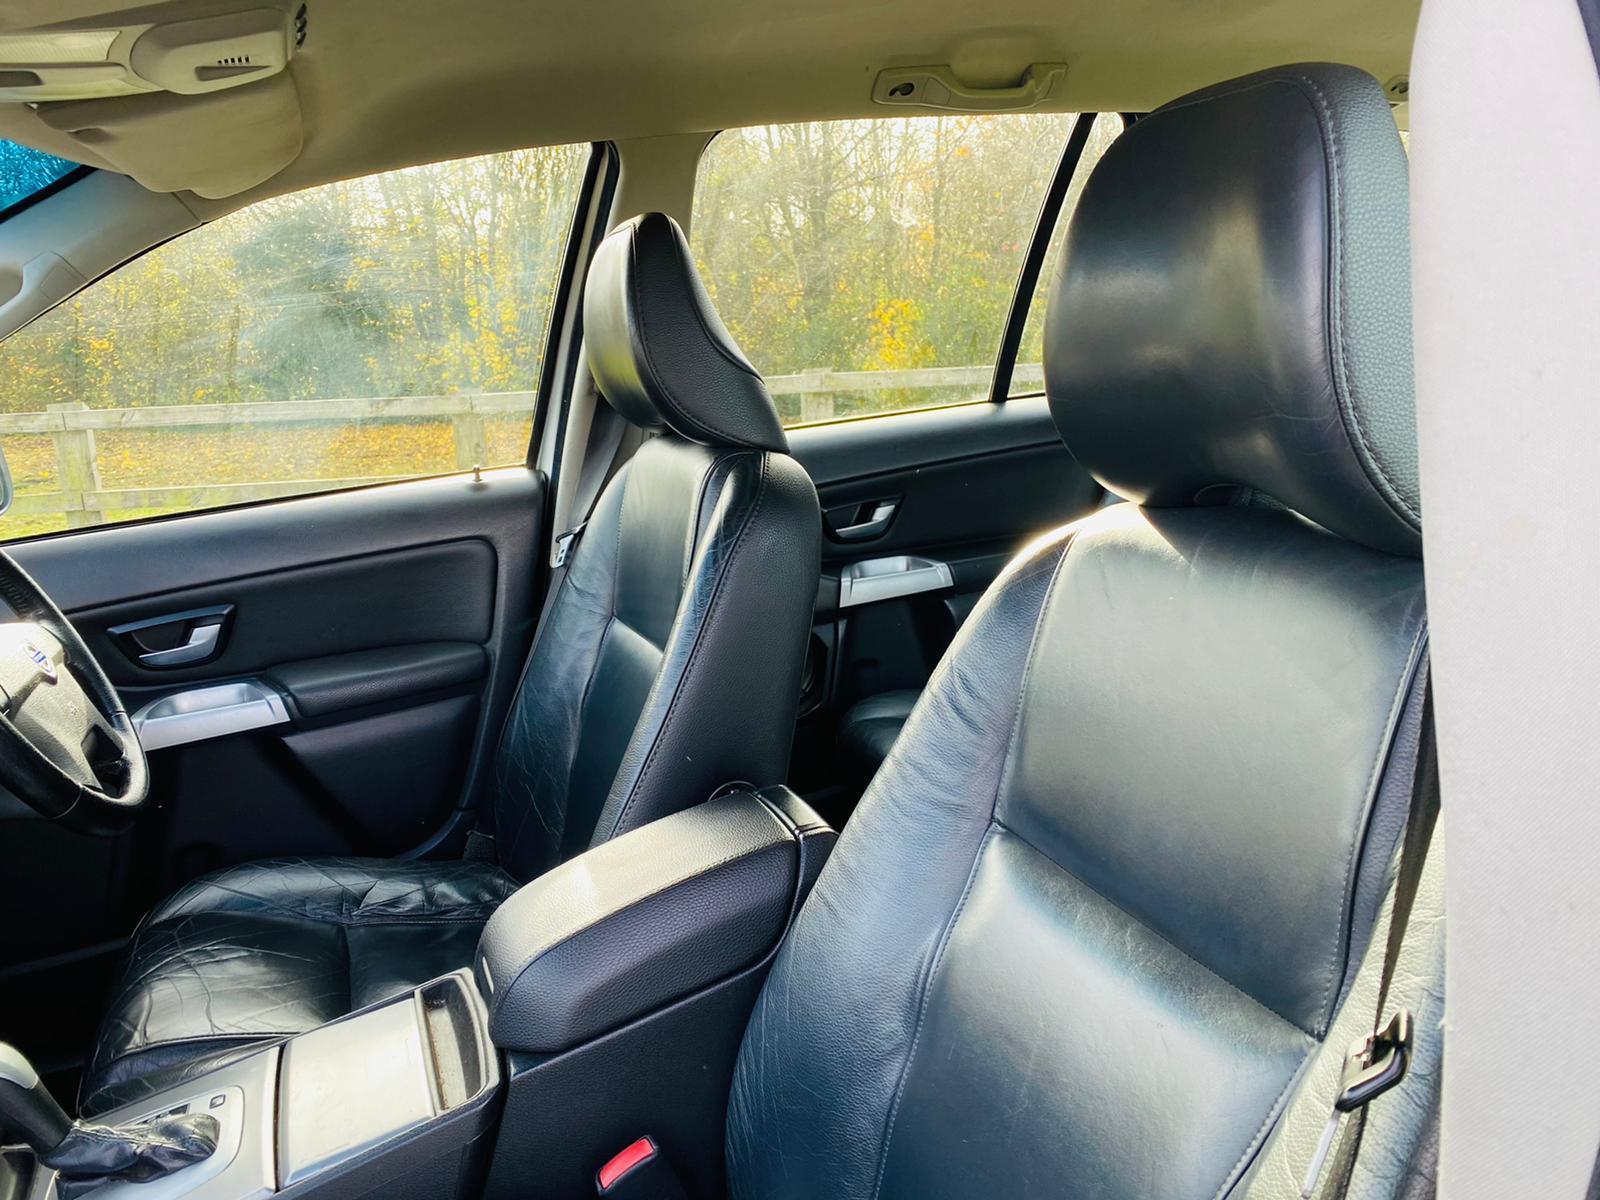 Volvo XC90 2.4 D5 185bhp SE Geartronic Auto 2006 06 Reg - 7 Seats - Air con - Top Spec - Image 29 of 47